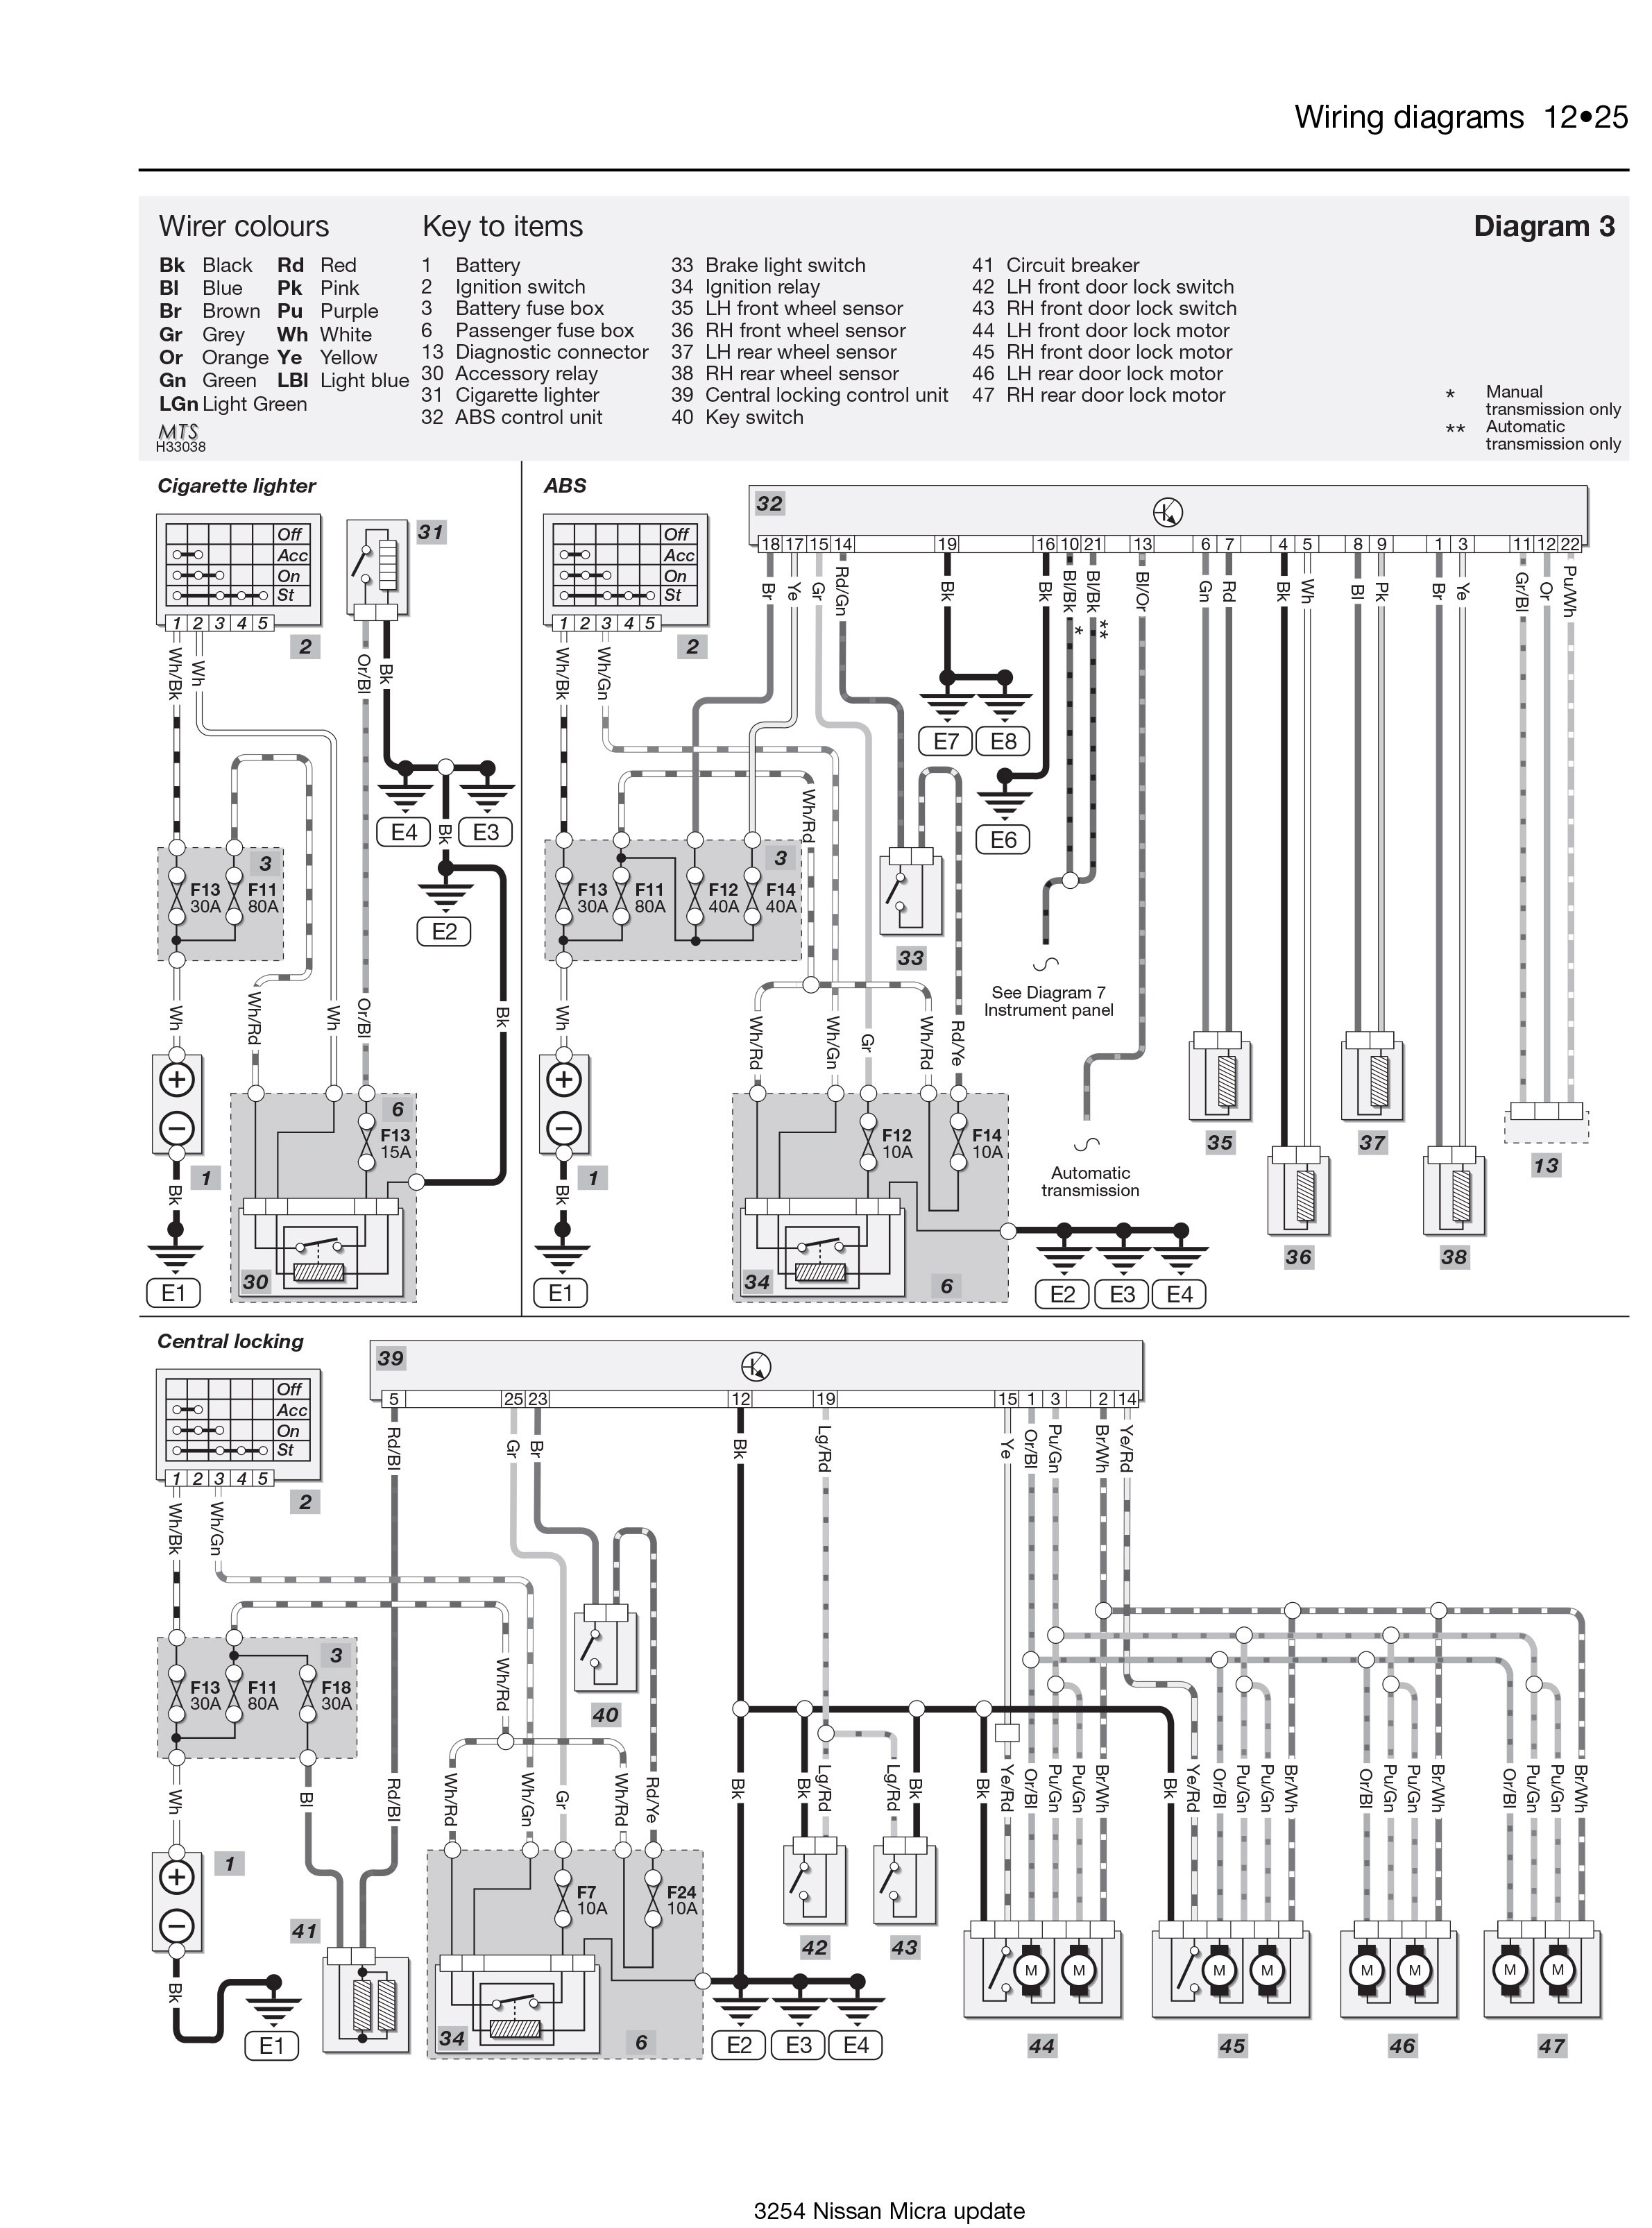 Nissan Micra Engine Diagram Nissan Micra 93 02 Haynes Repair Manual Of Nissan Micra Engine Diagram Repair Guides Wiring Diagrams Autozone Entrancing Nissan Afif